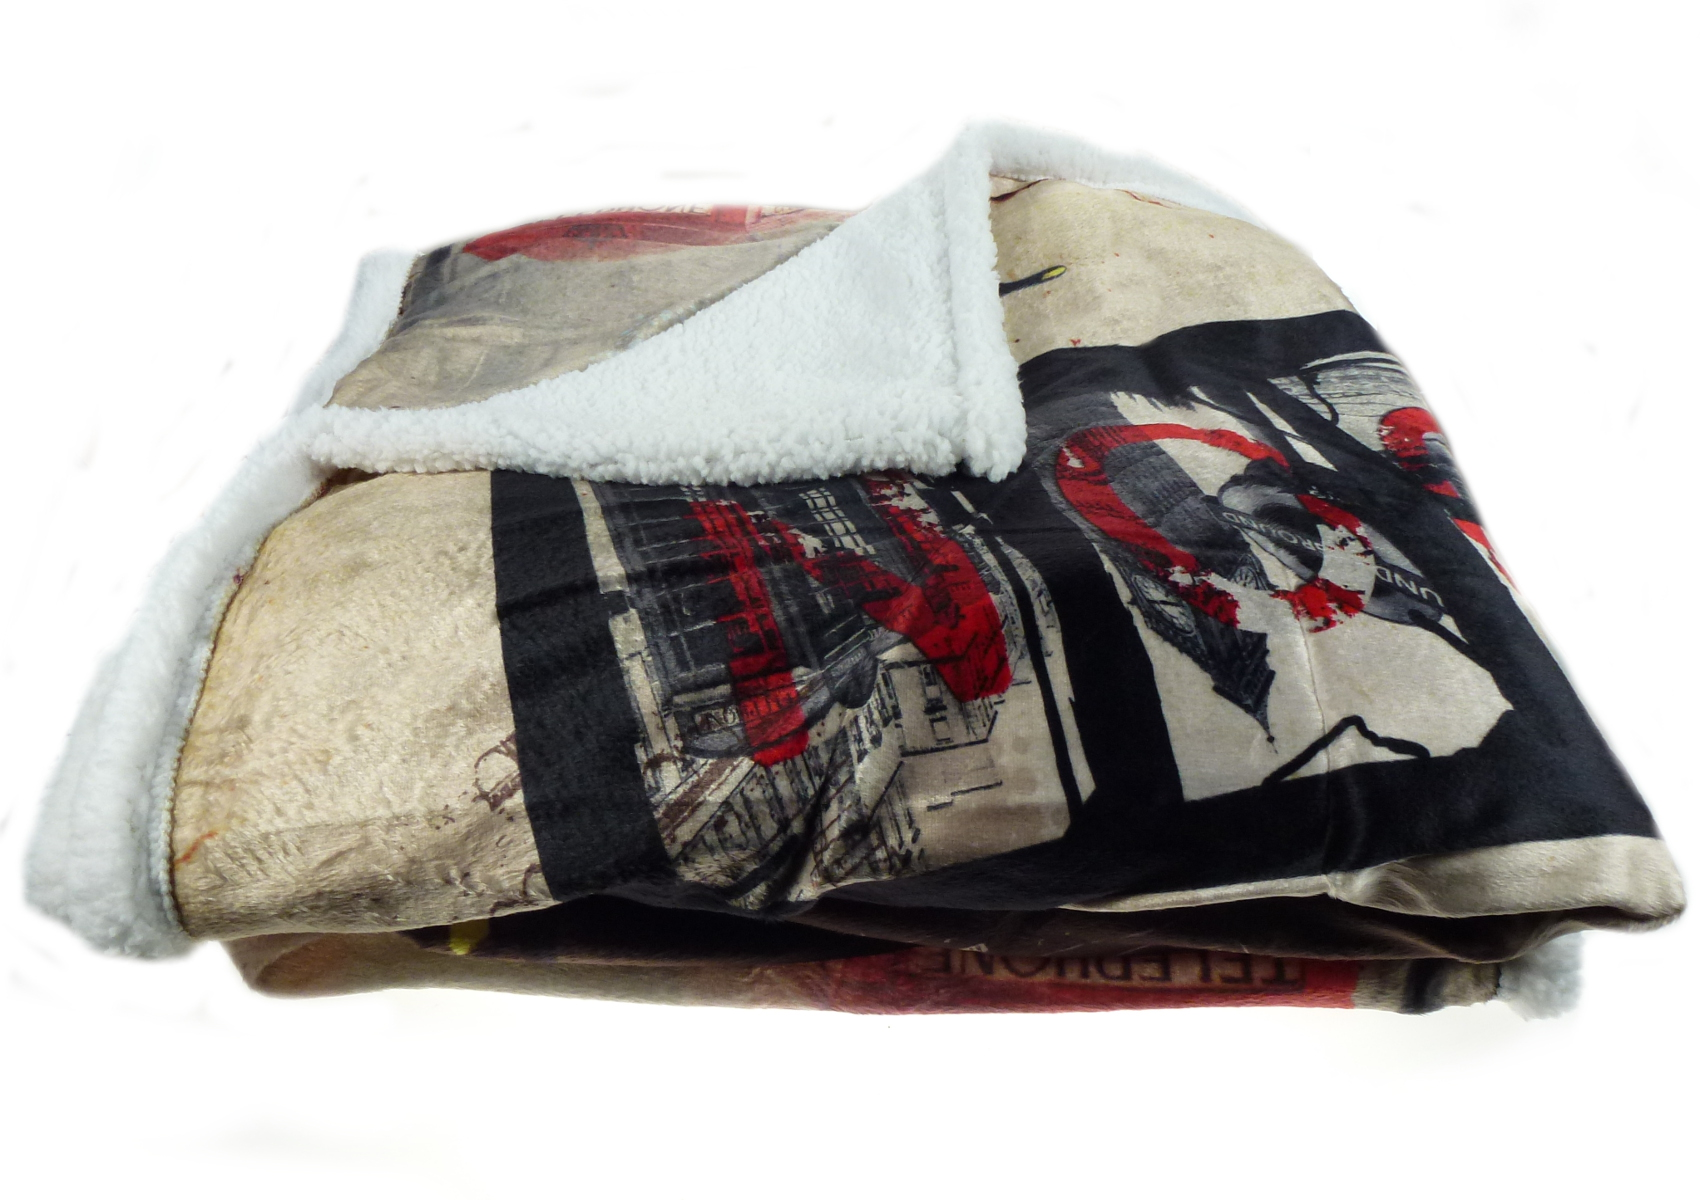 City Love Blanket Super Soft Sherpa Fleece Reversible Bed